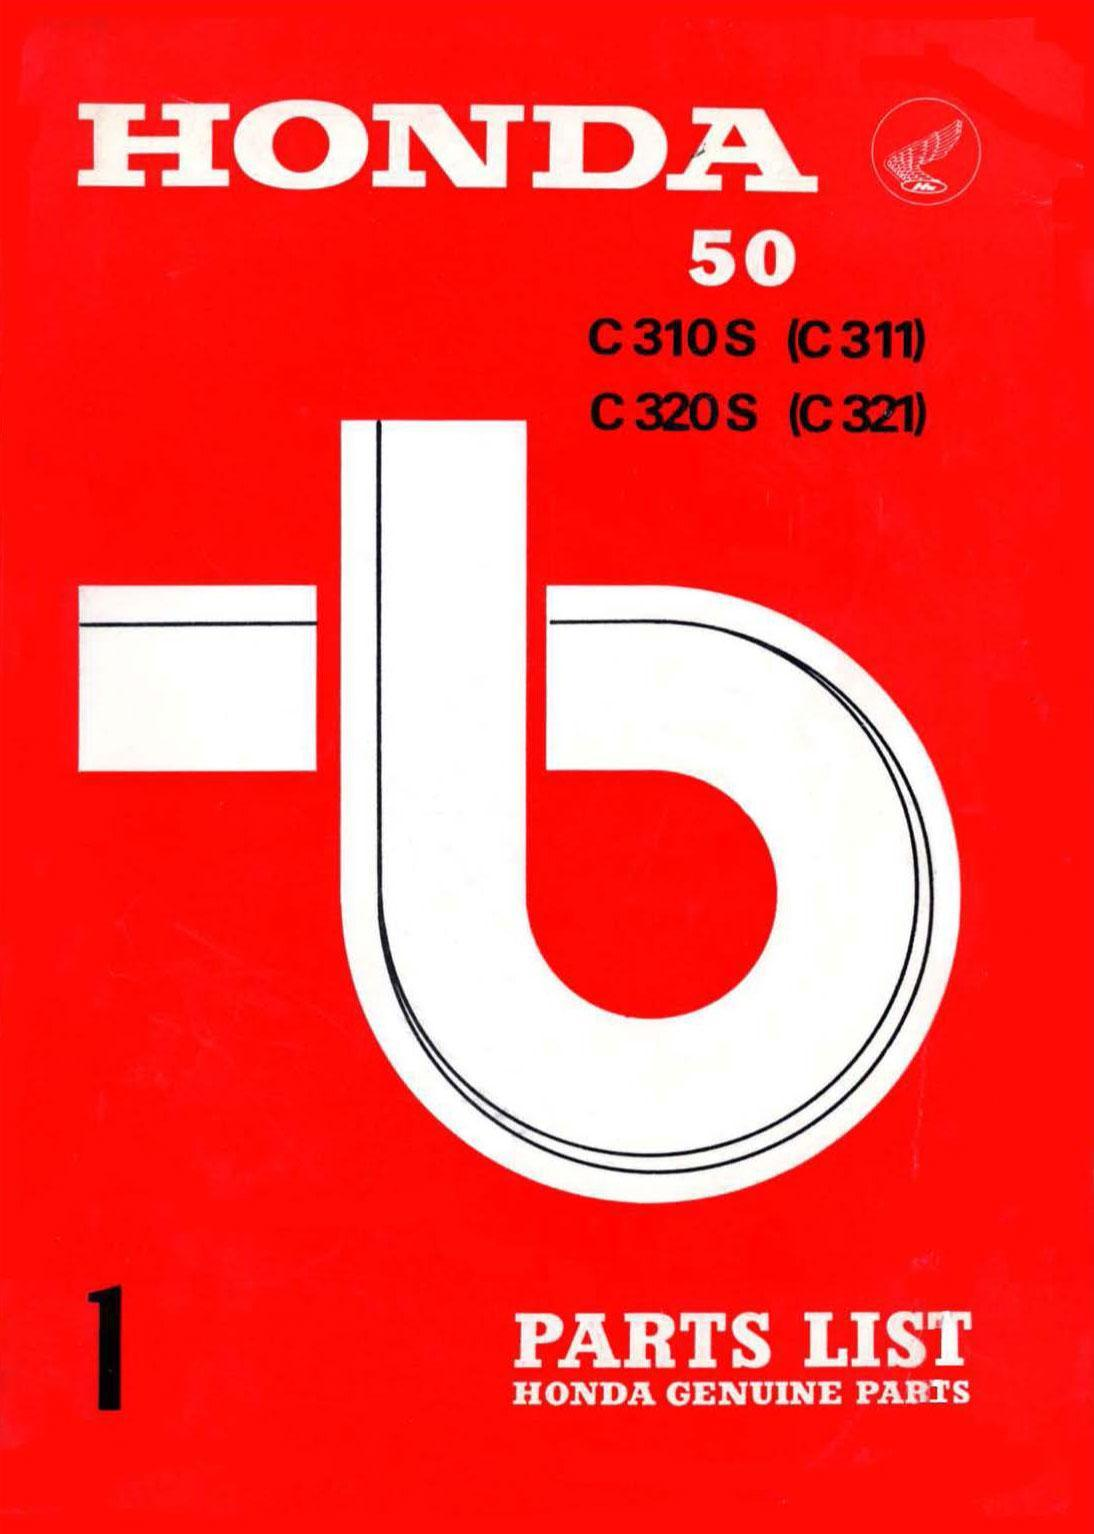 Parts List for Honda C311 (1967)